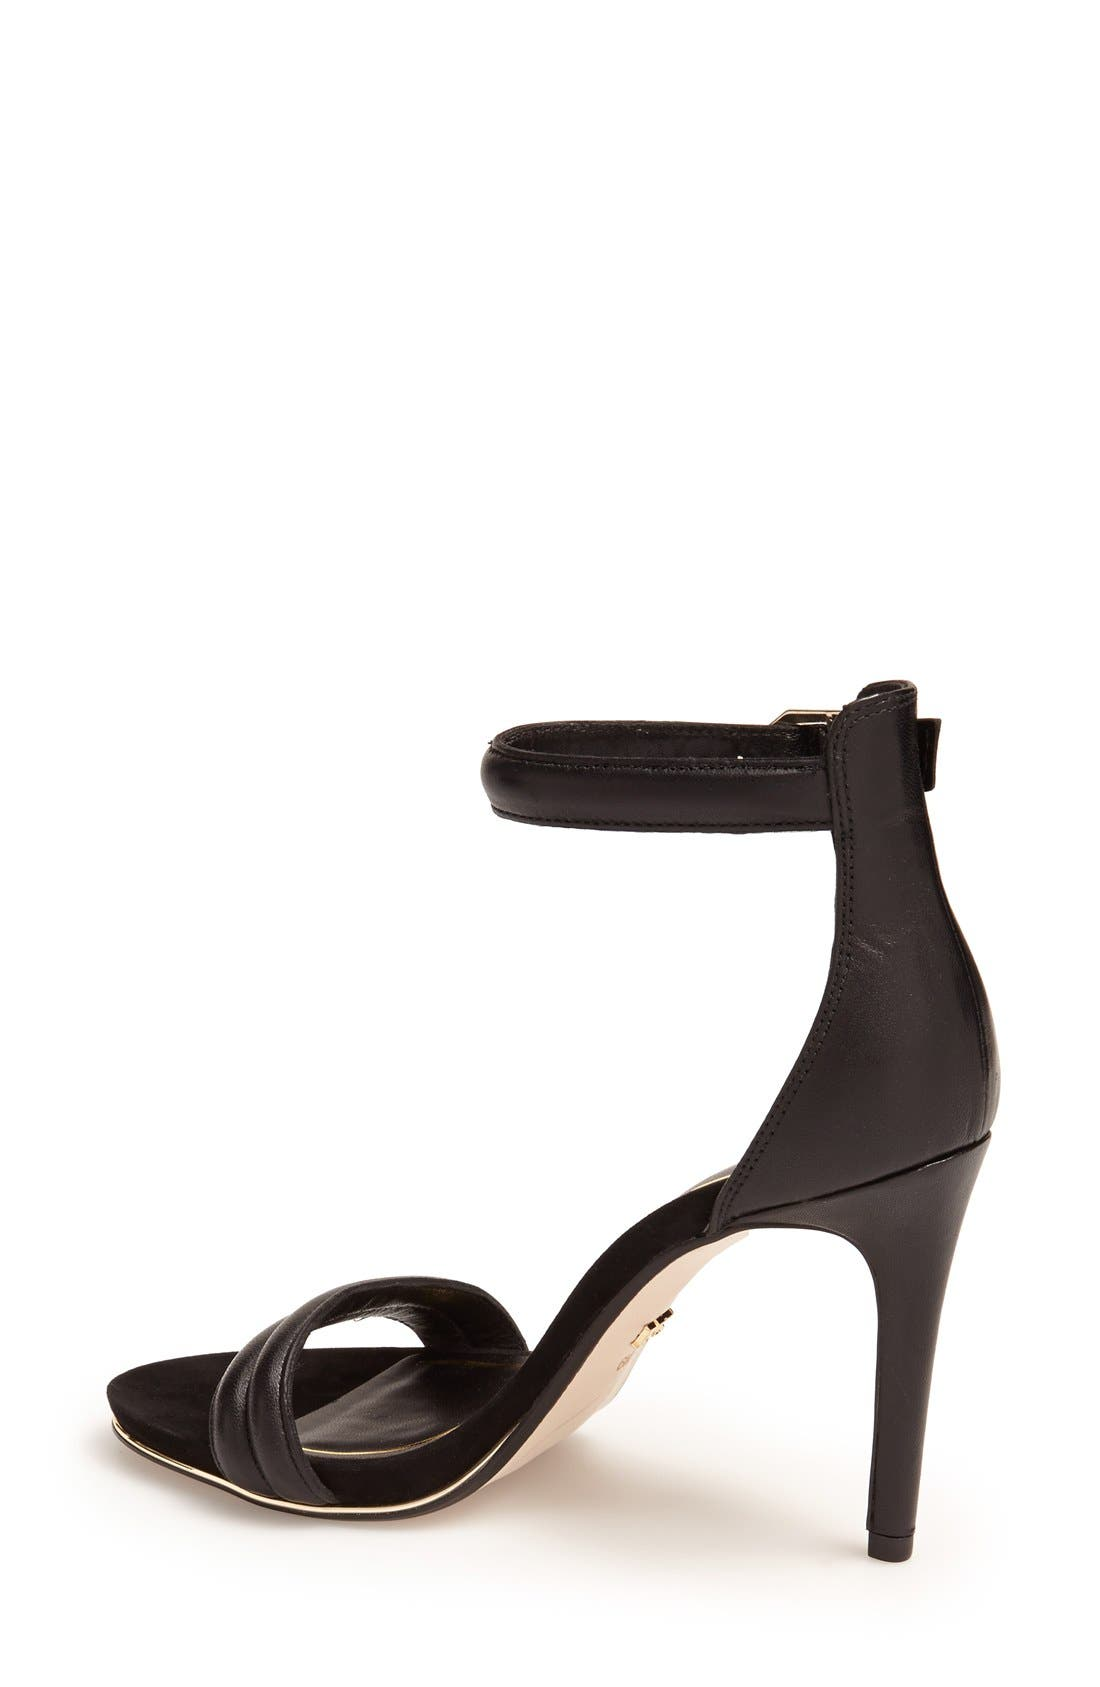 KENNETH COLE NEW YORK,                             'Brooke' Ankle Strap Sandal,                             Alternate thumbnail 4, color,                             BLACK LEATHER